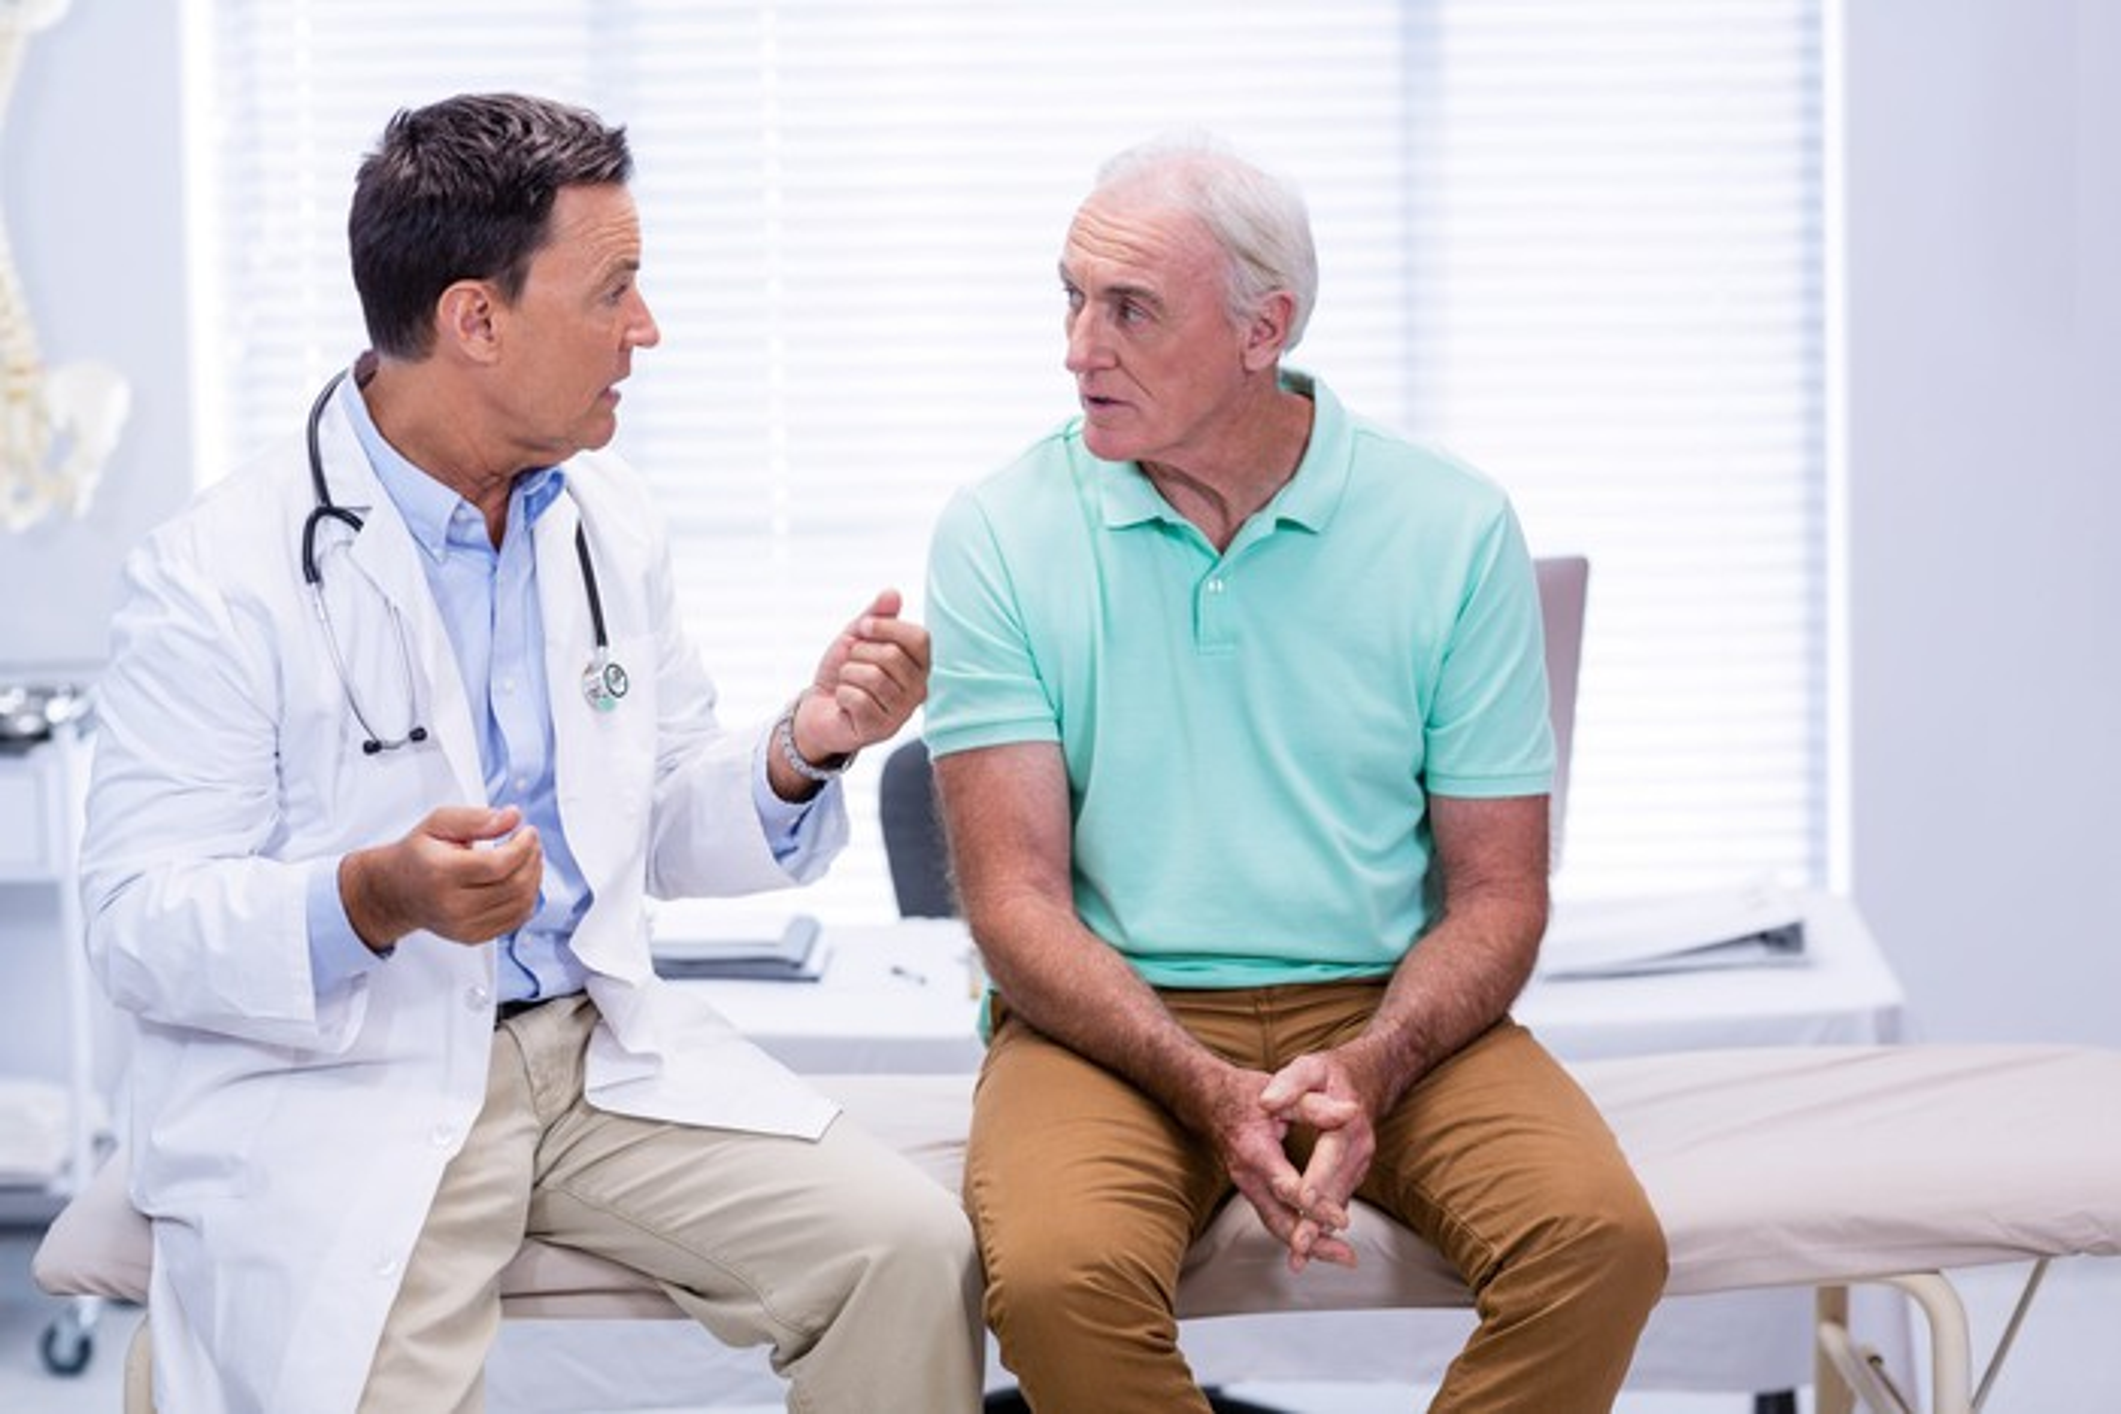 Doctor talking to senior man sitting on an exam table.